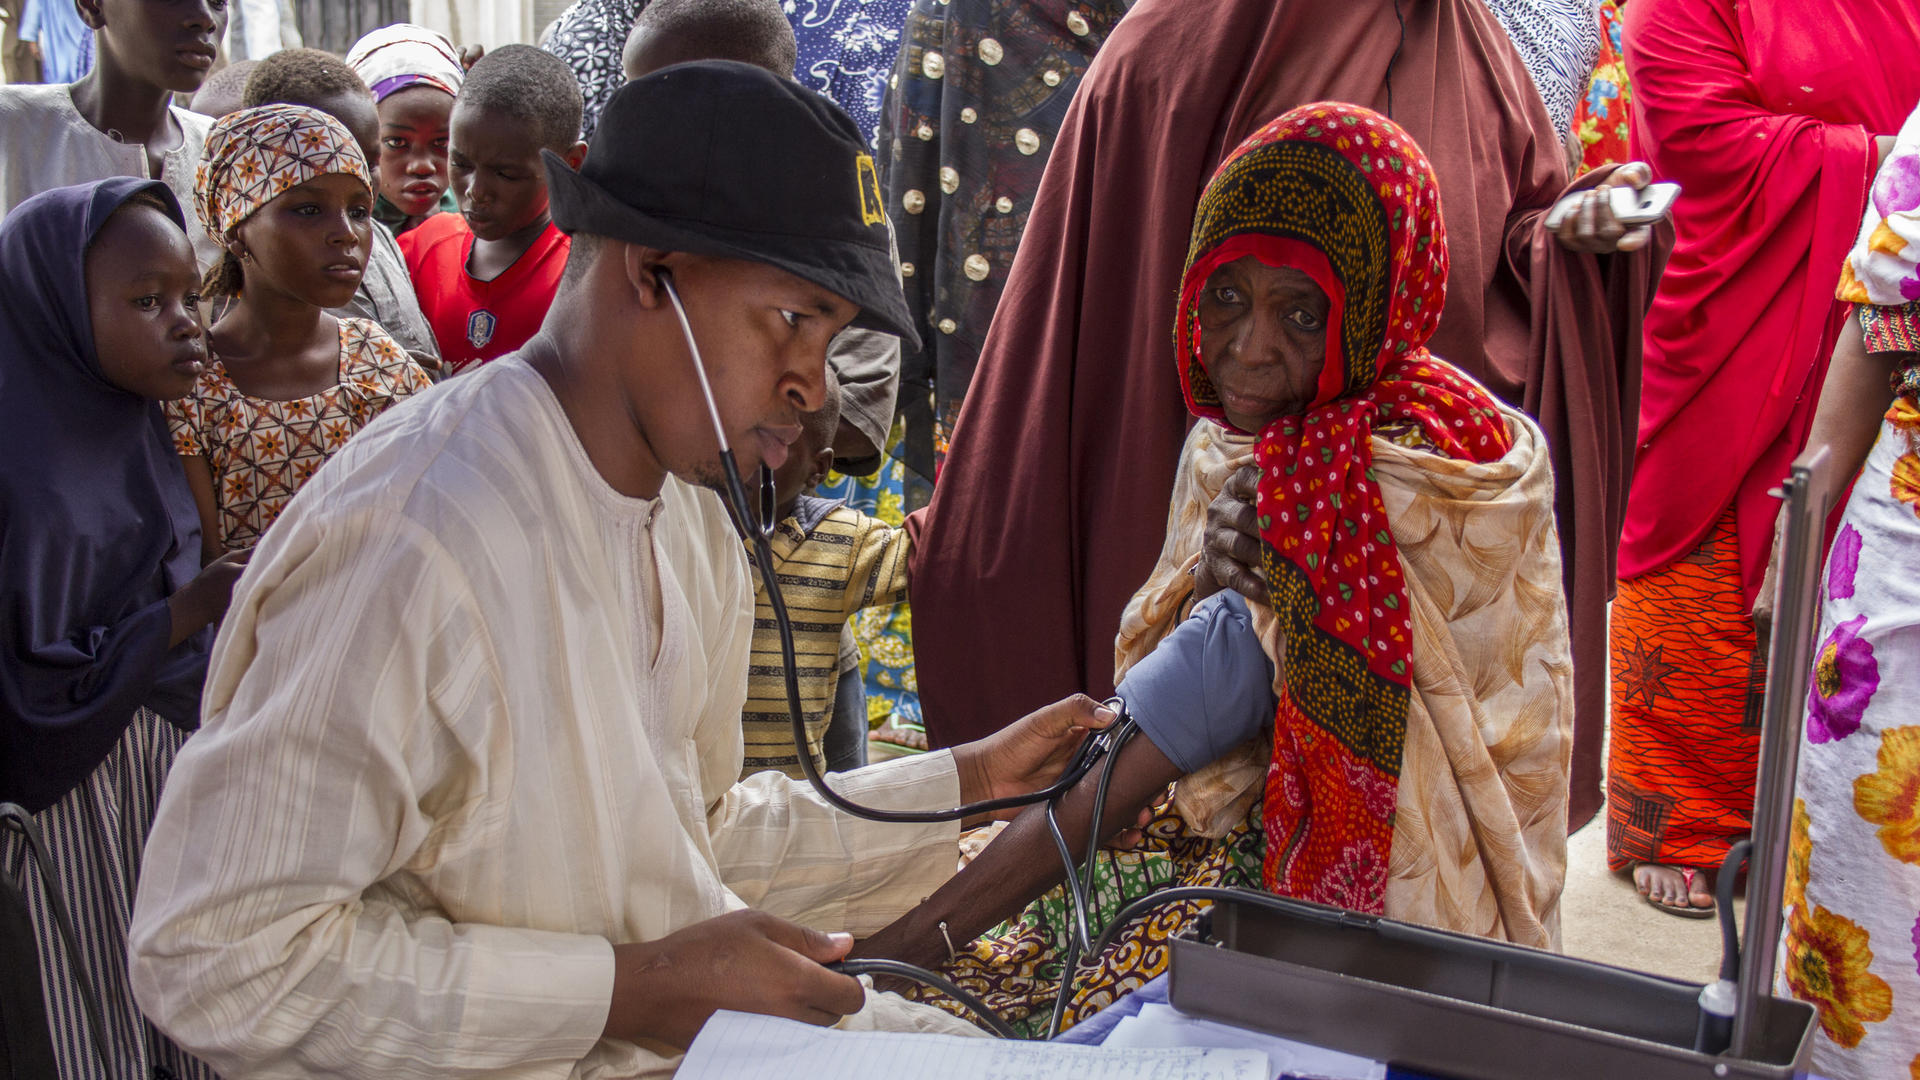 An IRC health worker checks an elderly woman's blood pressure